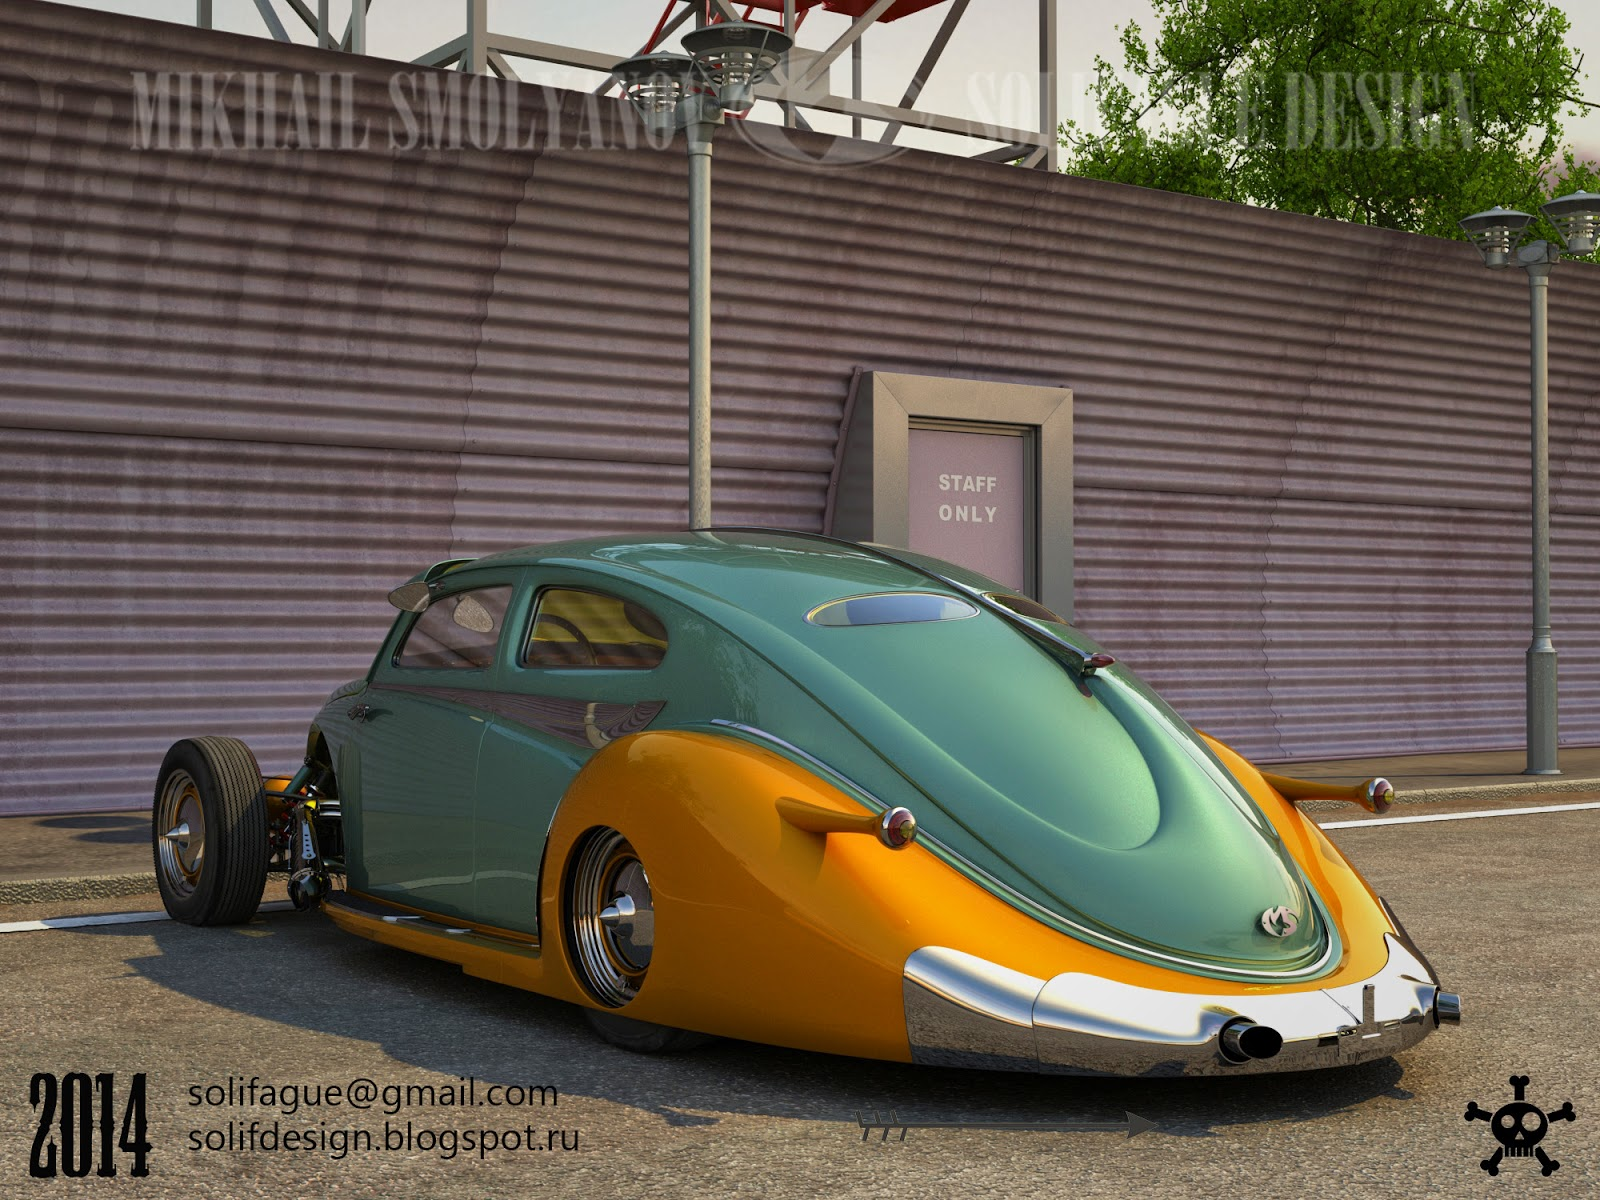 Who Designed The Vw Beetle >> Solifague Design: VW Beetle Custom.